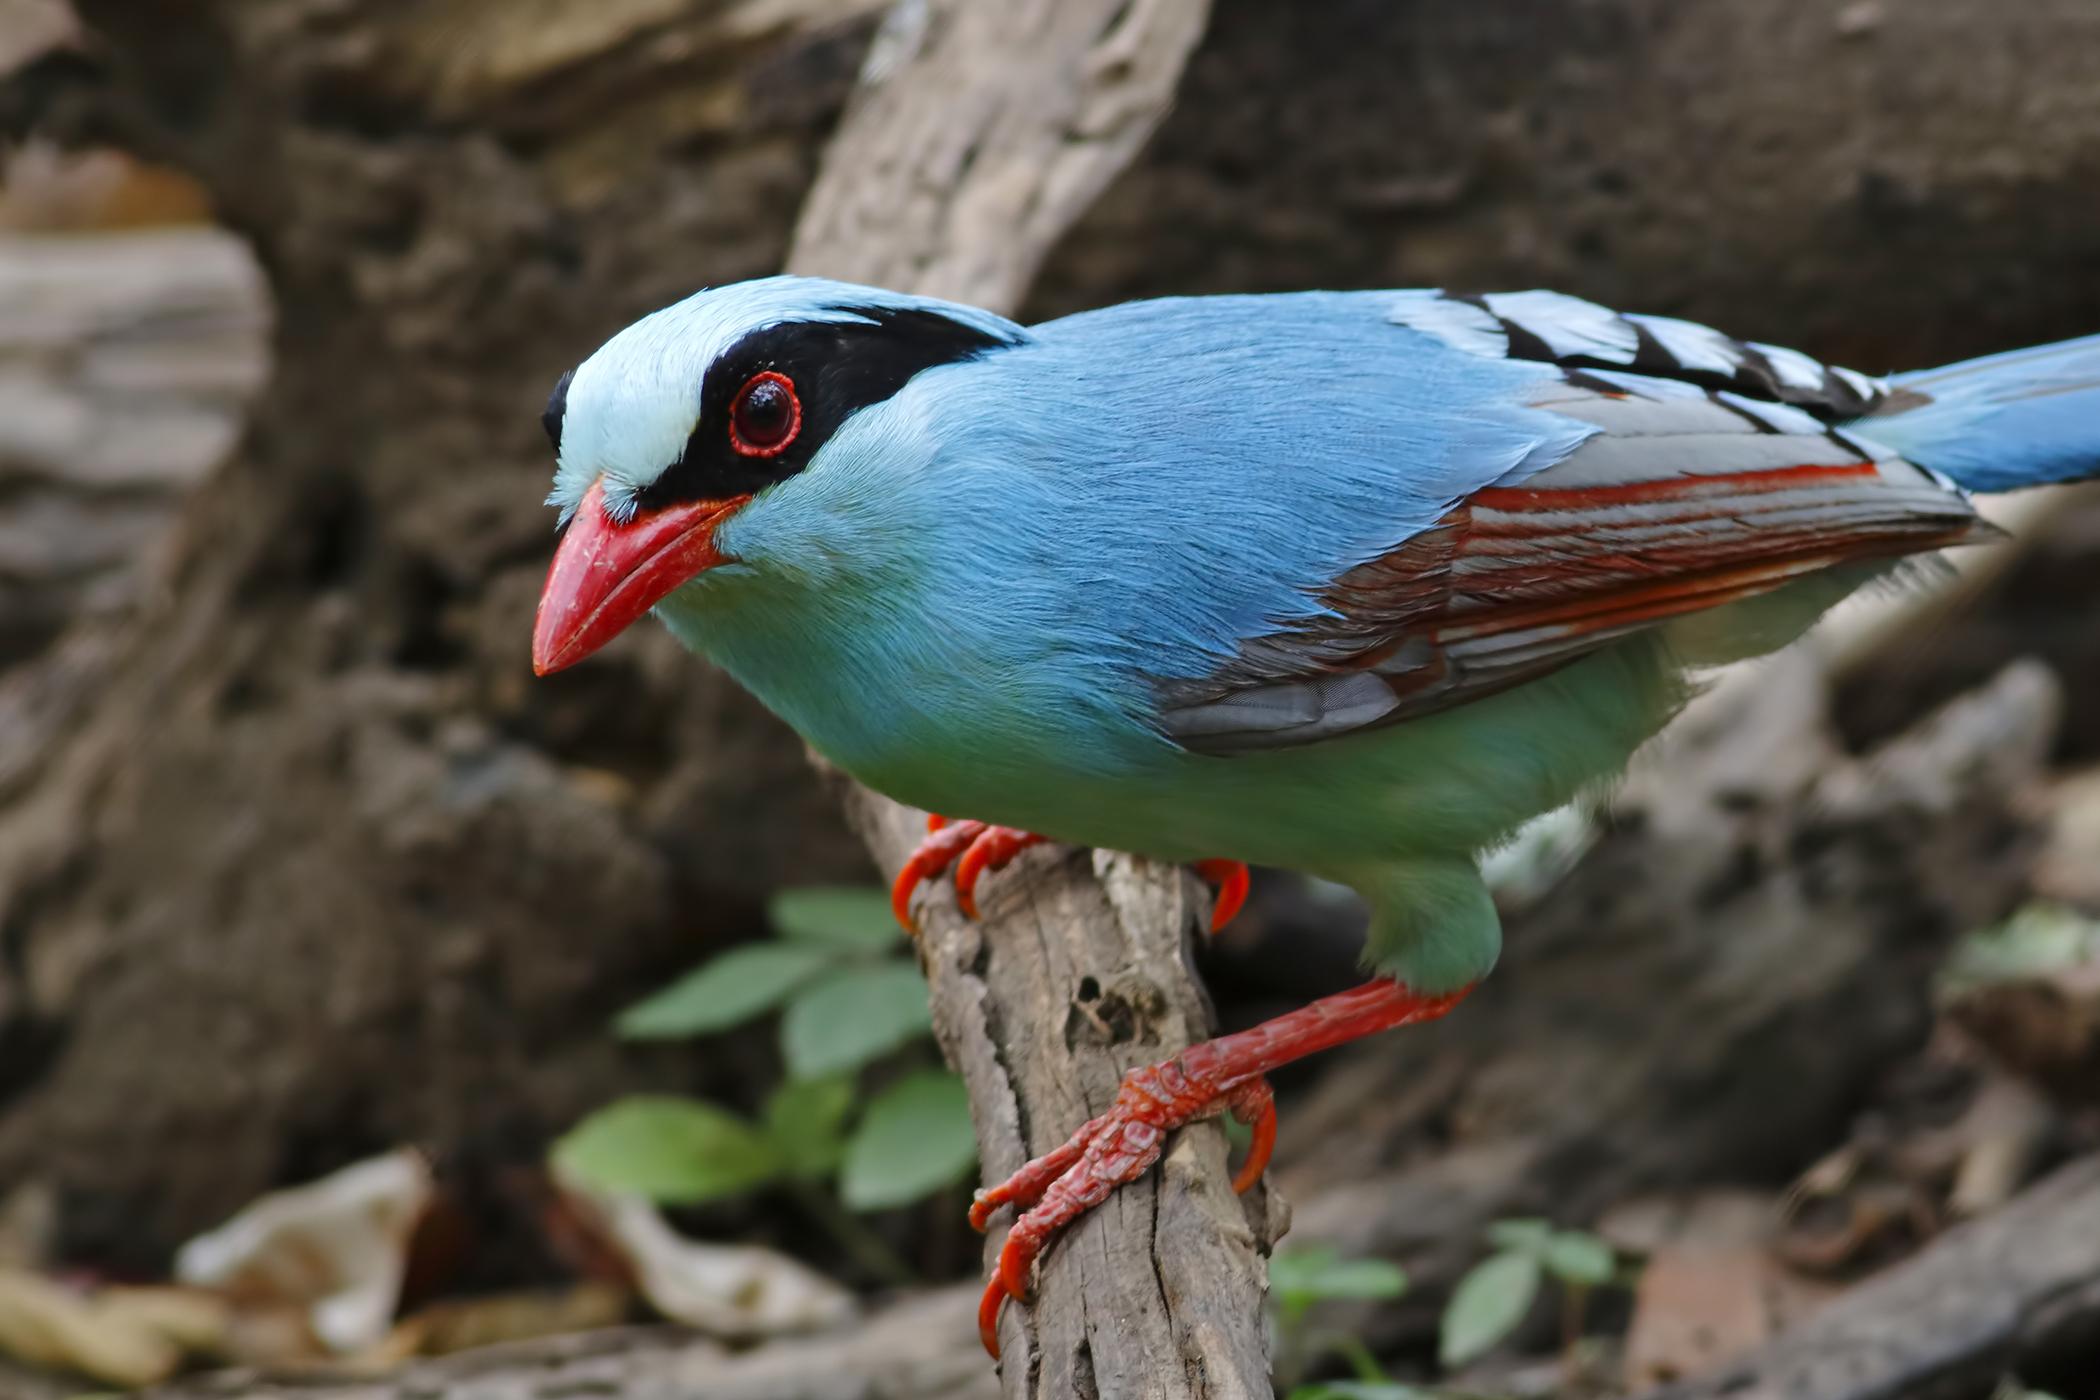 Cloacal Prolapse in Birds